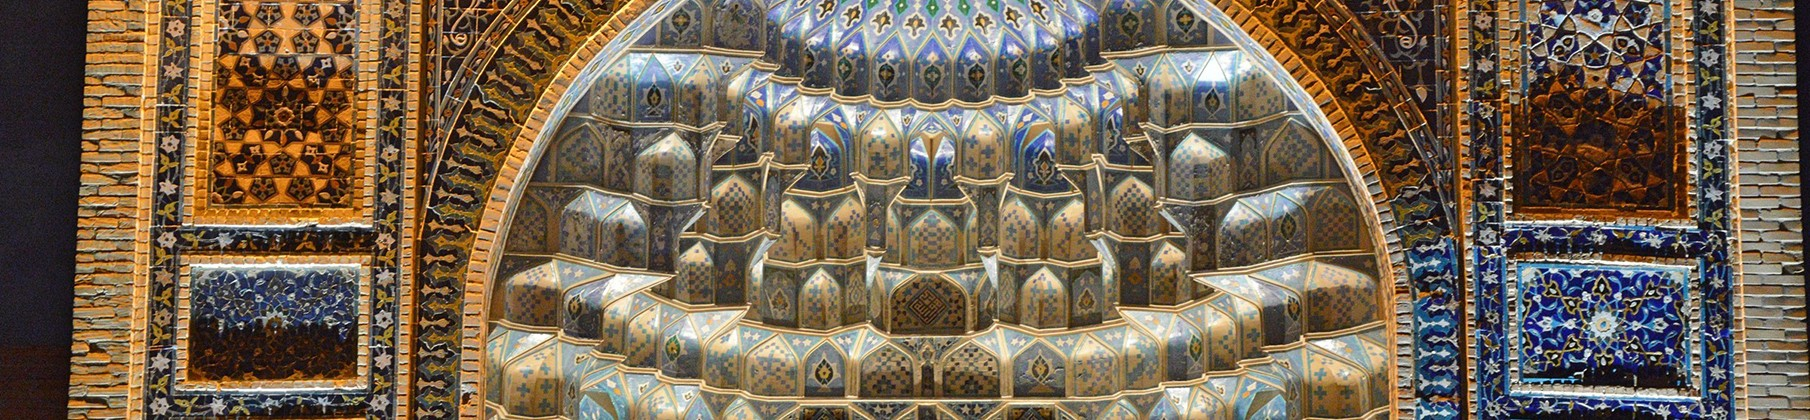 Gur Emir - Burial Vault of Timurids - 1